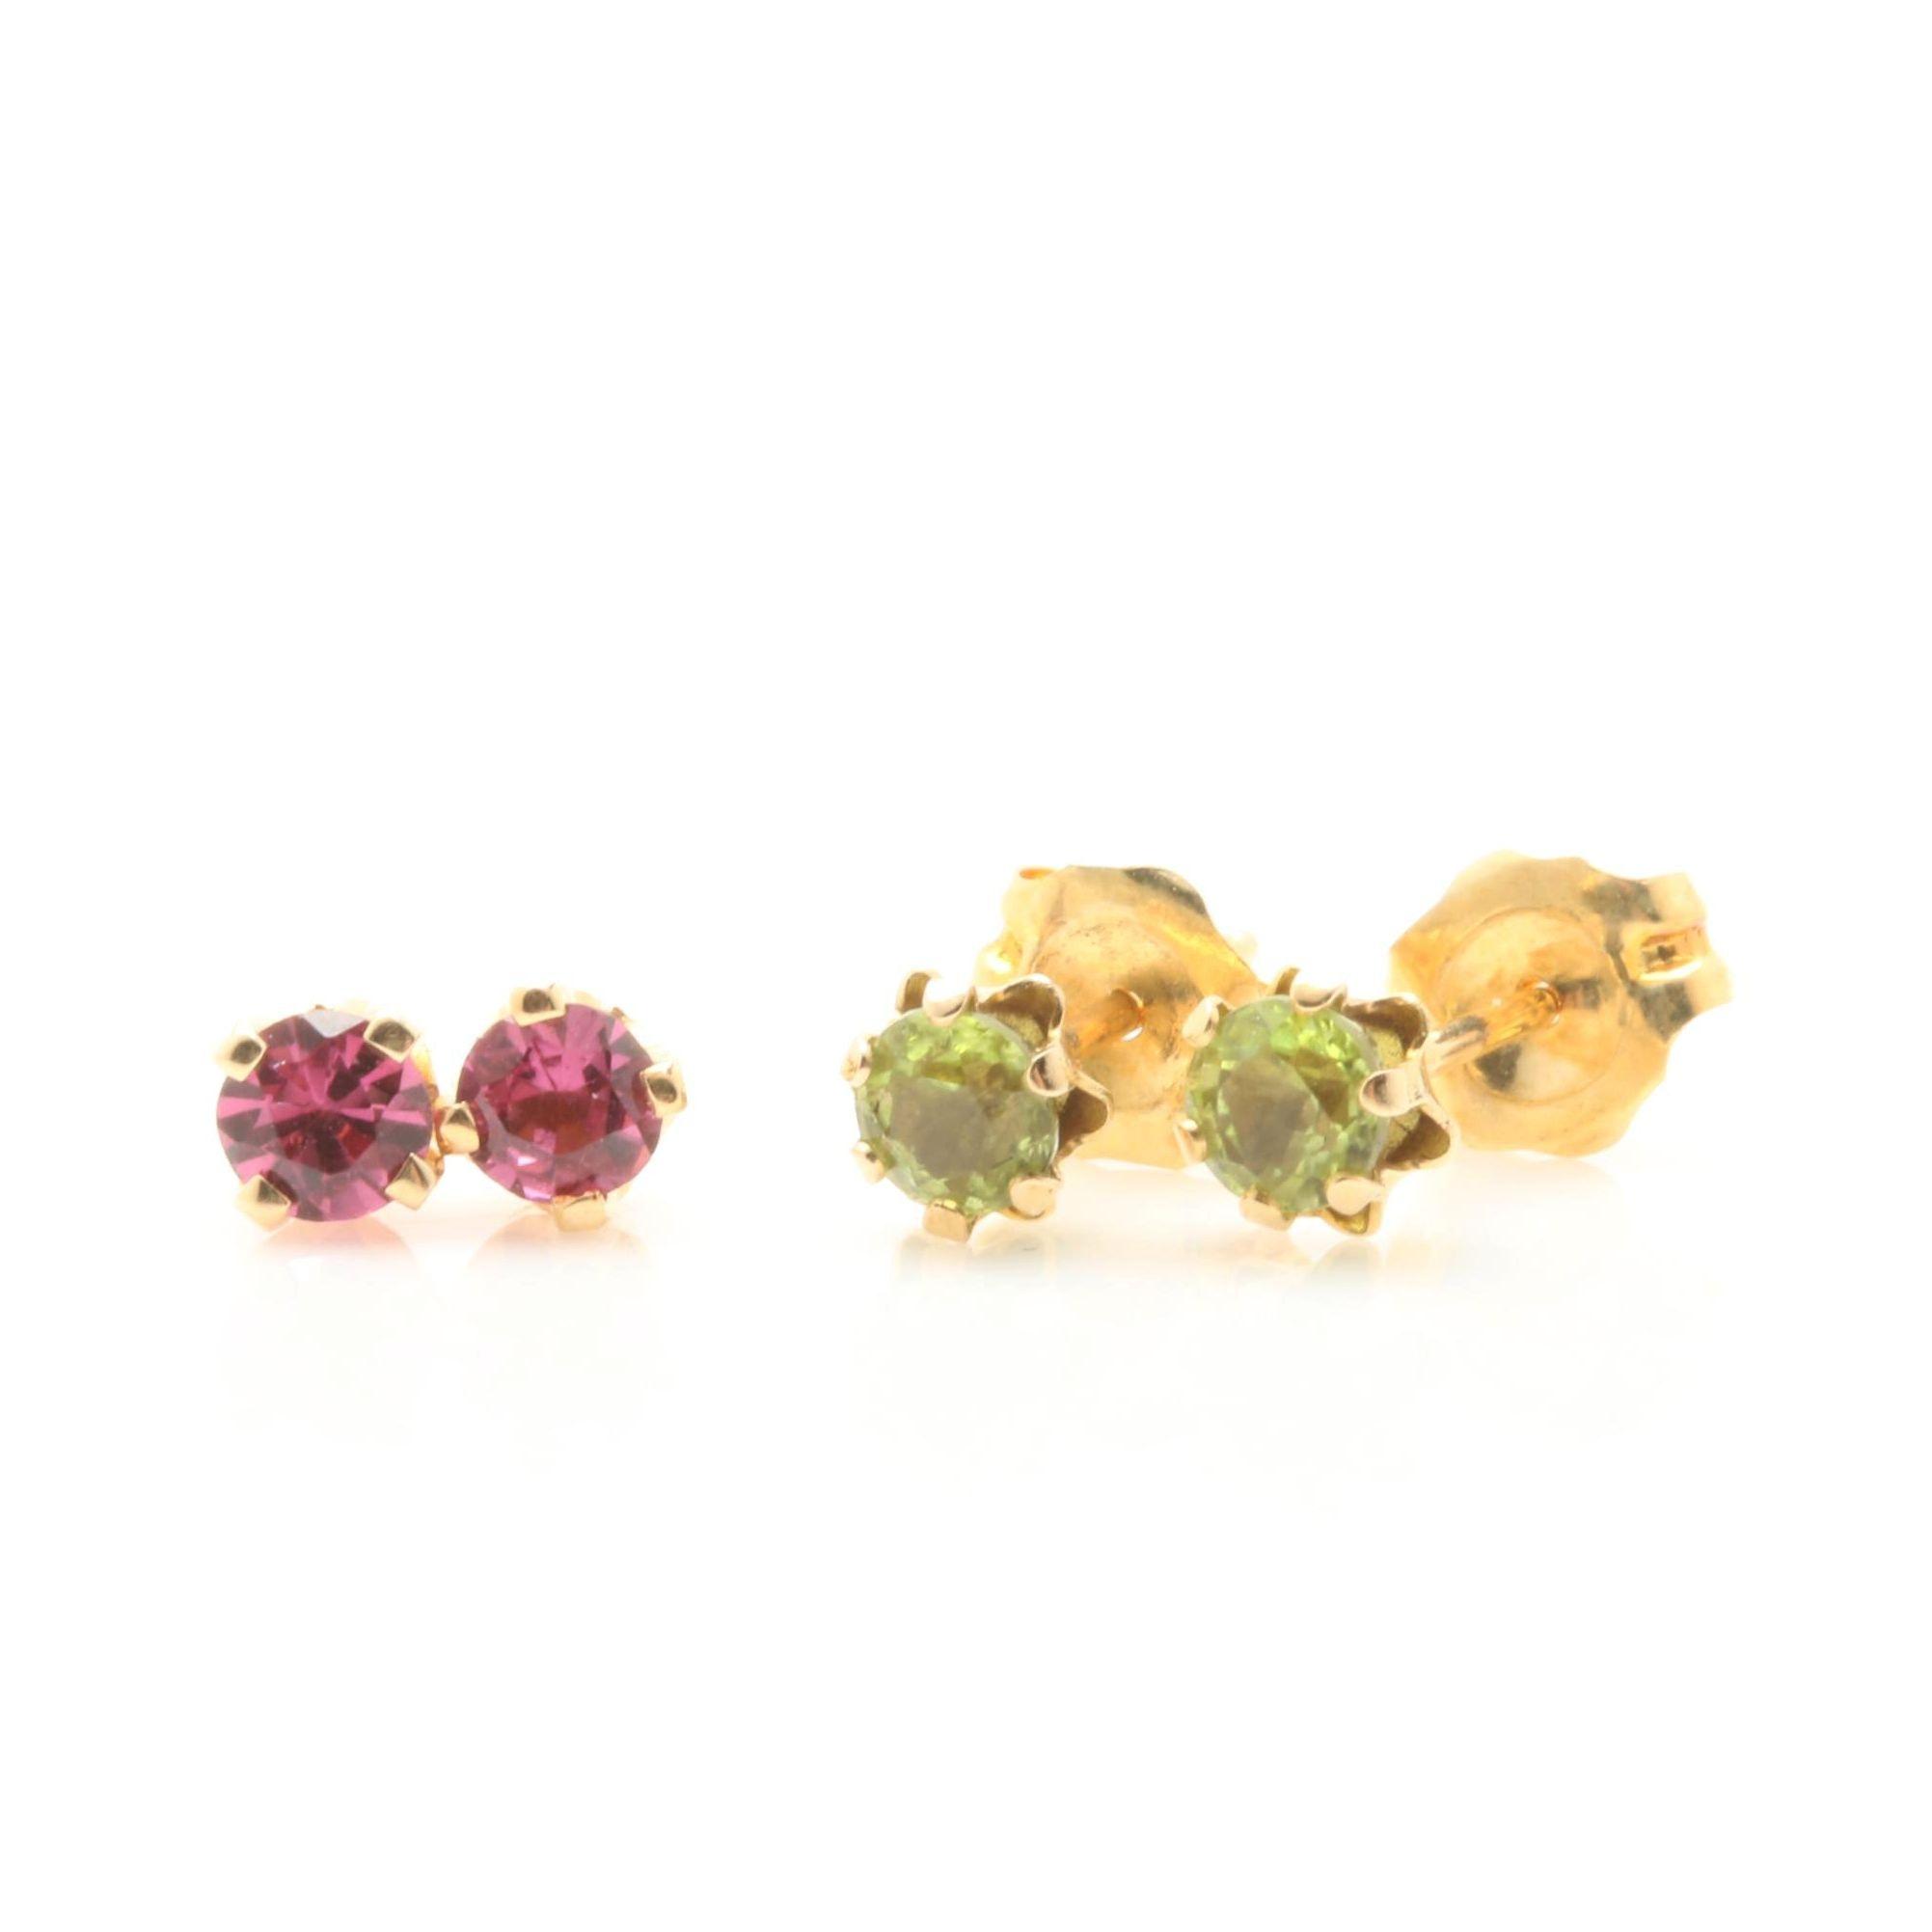 14K Yellow Gold Rhodolite Garnet and Peridot Stud Earrings